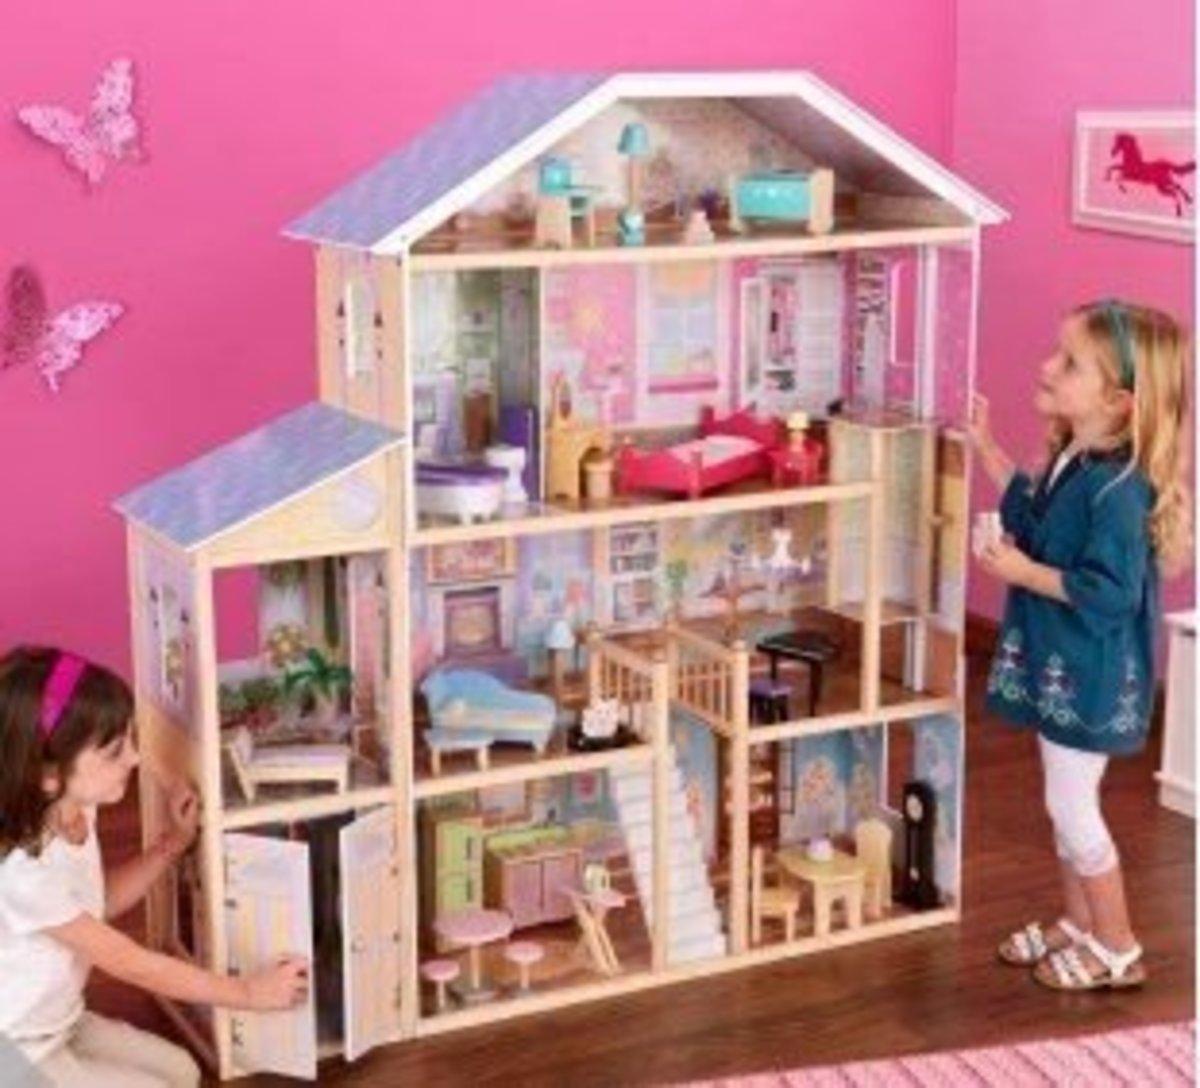 Plans to build a barbie house